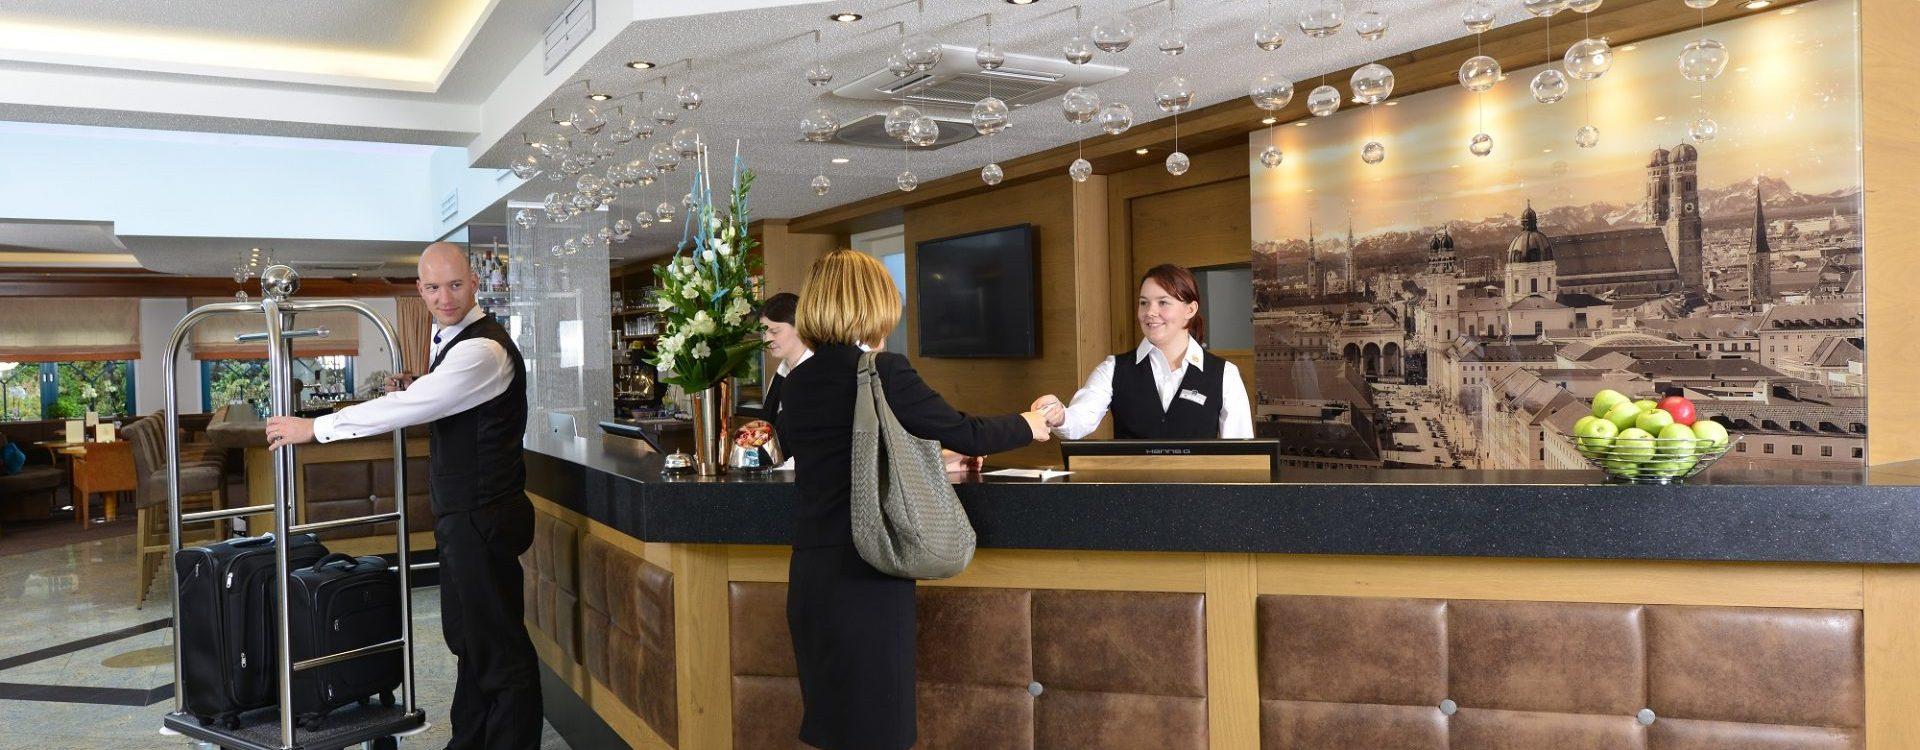 lobby_hotel_erb_parsdorf_1